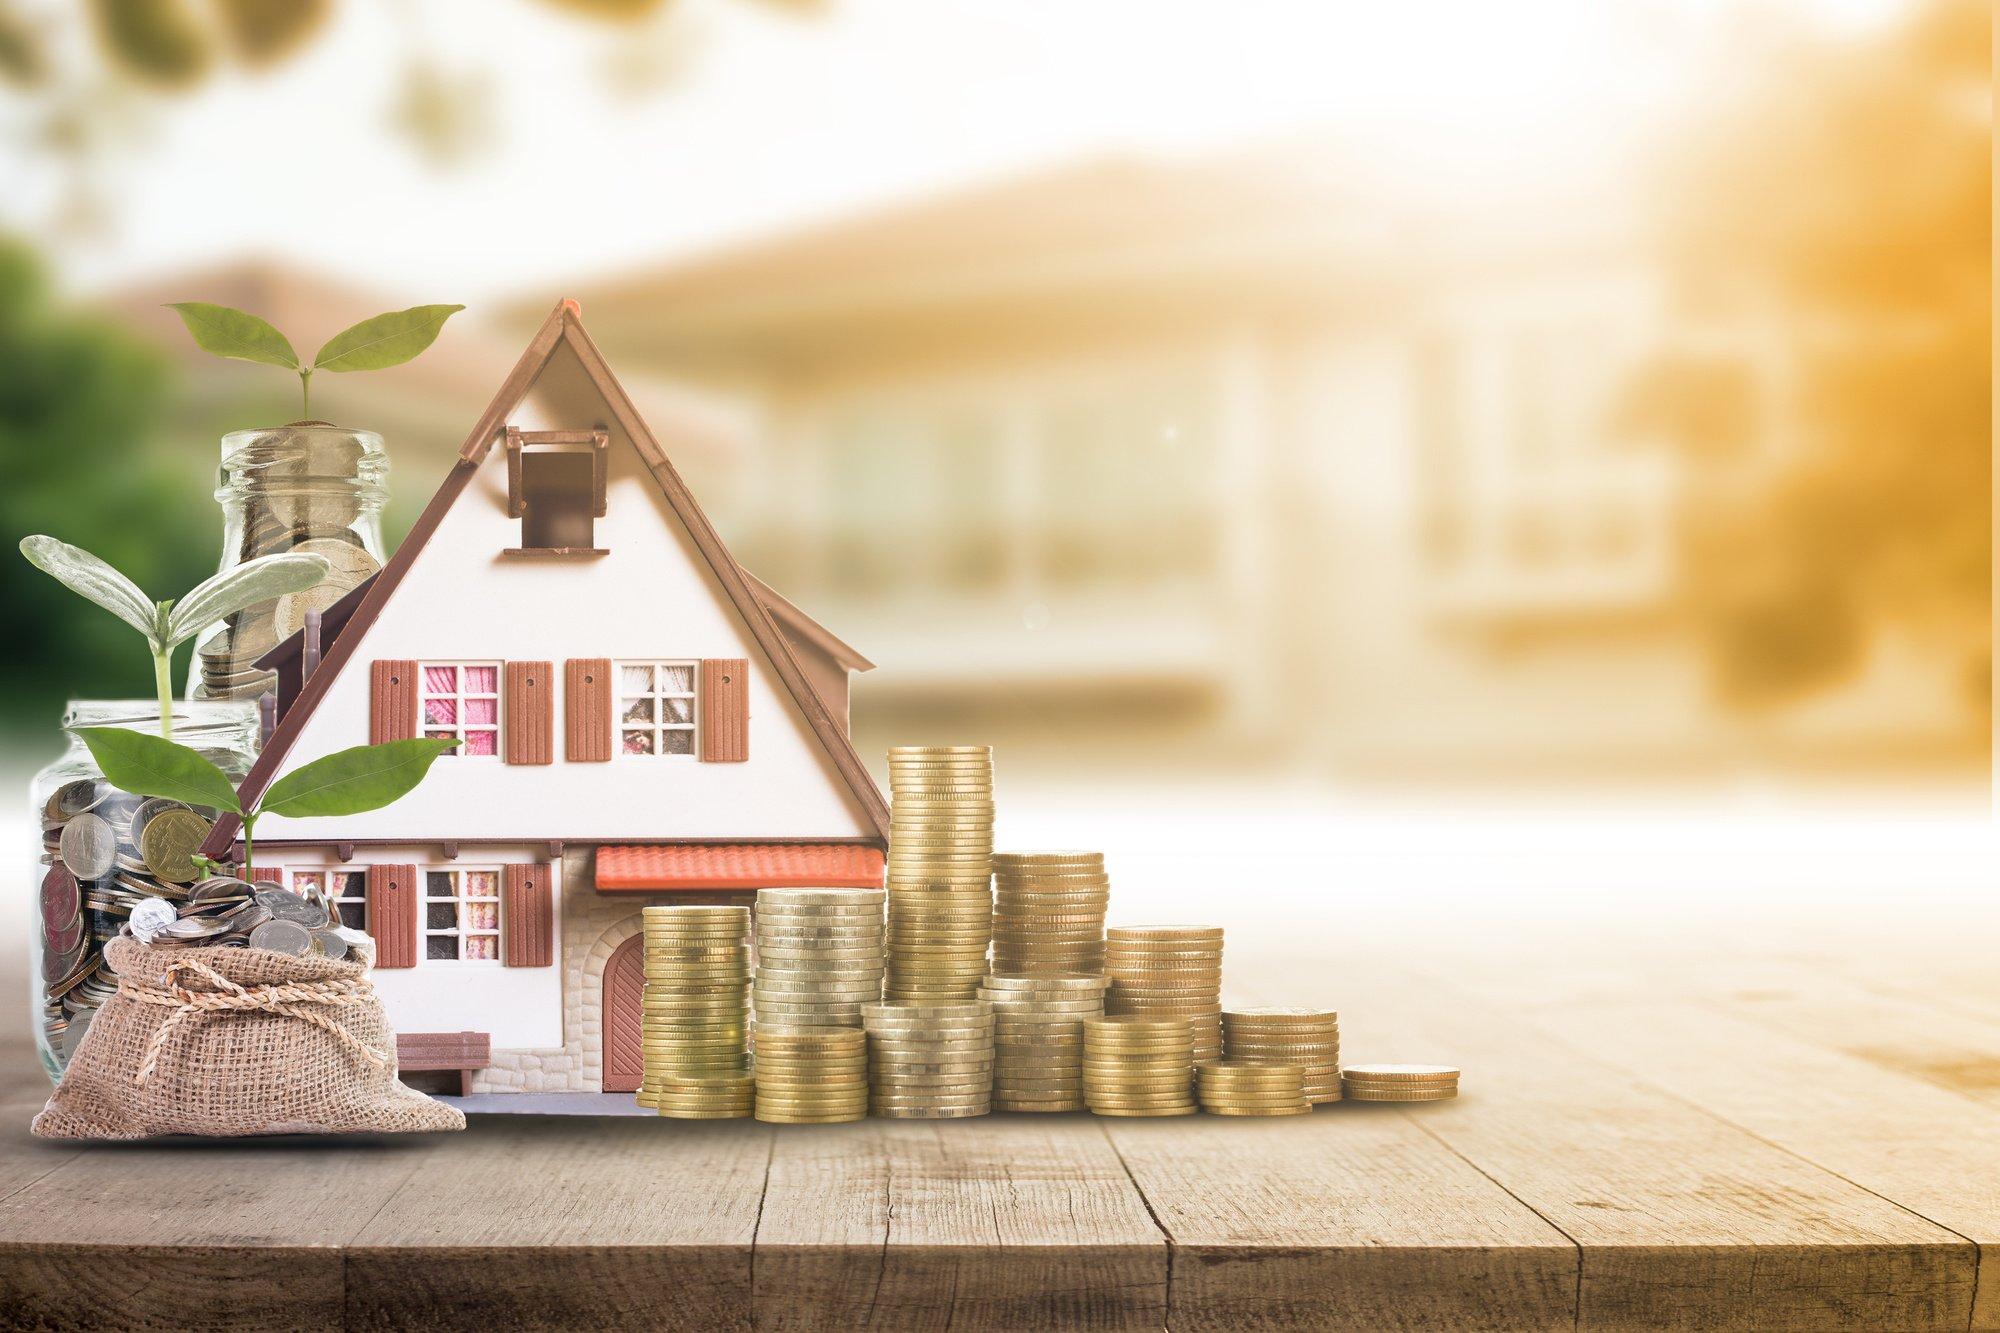 Mortgage loading real estate property